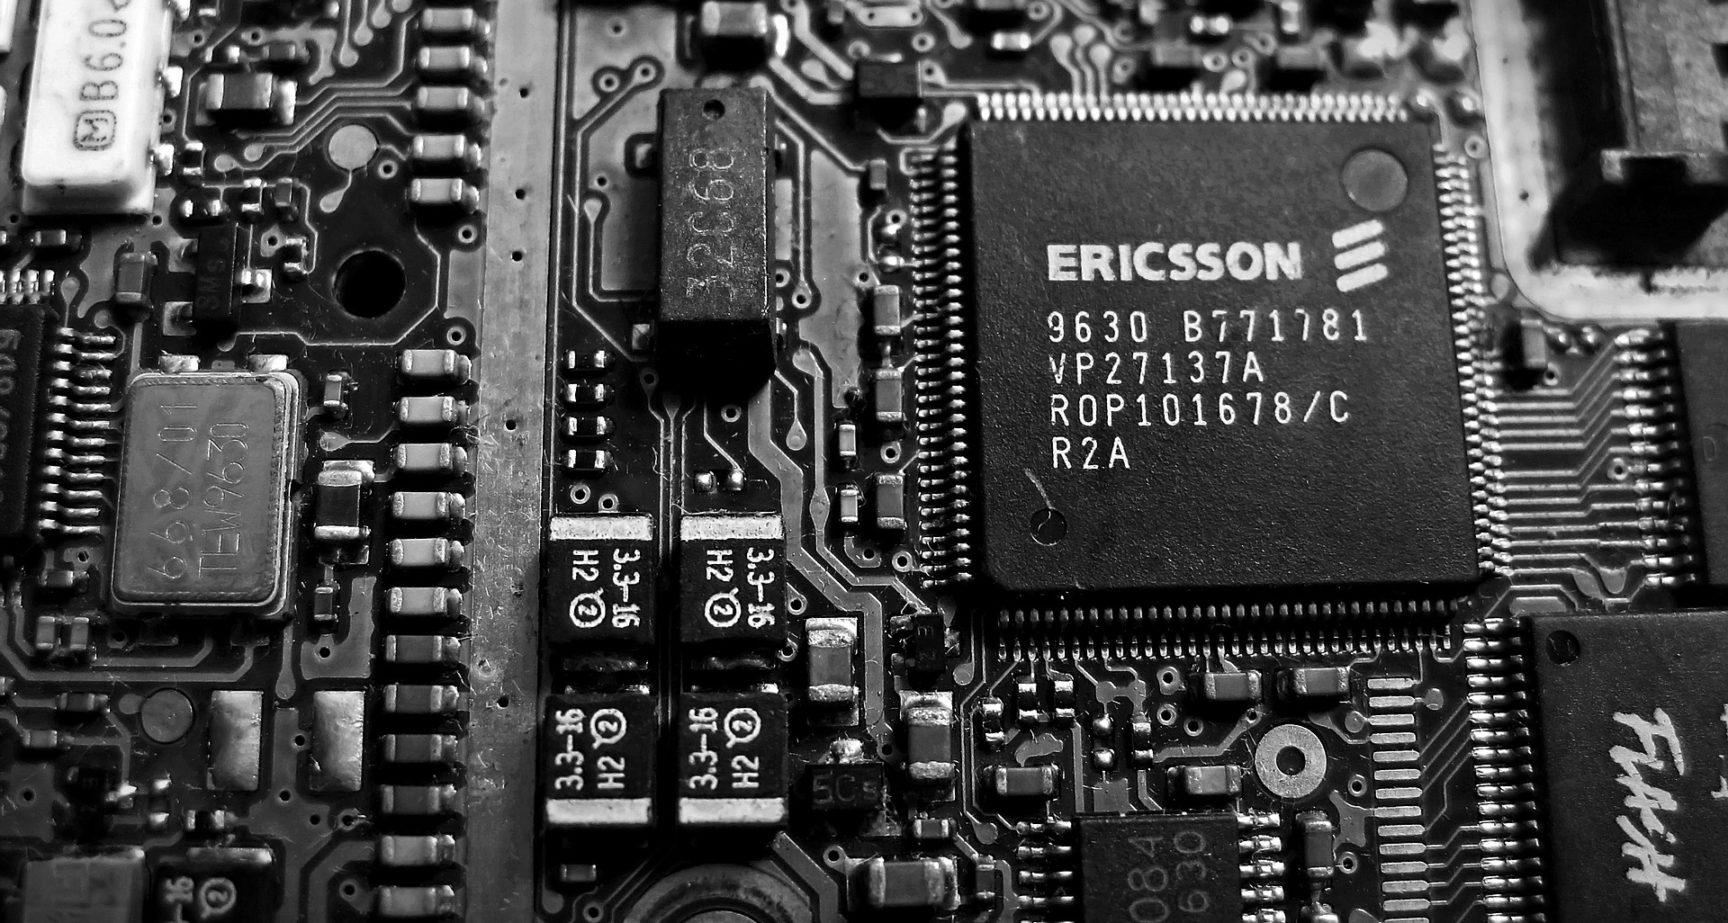 Ericsson mutade Clinton enligt Donald Trump